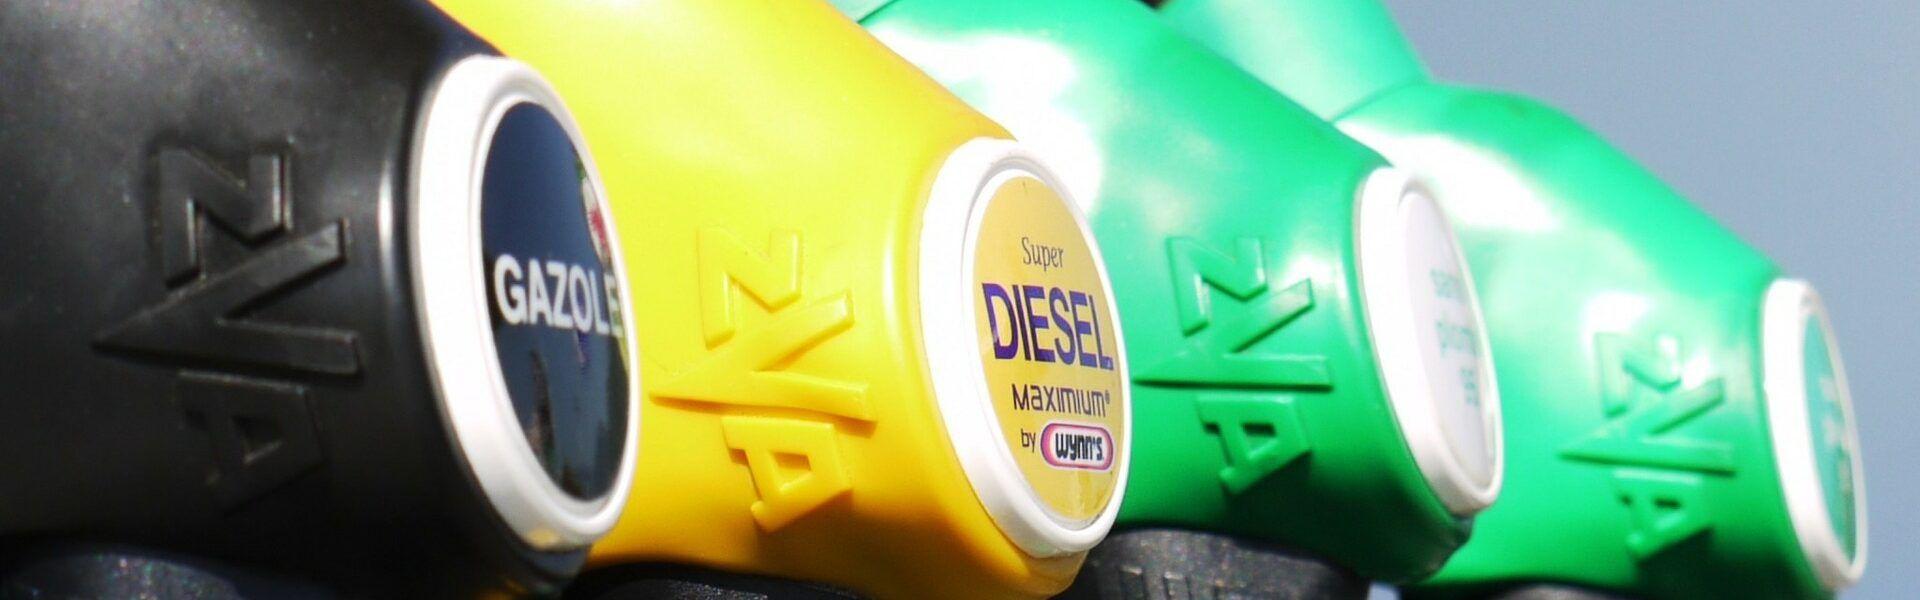 coche diesel e1617134915291   Total Renting